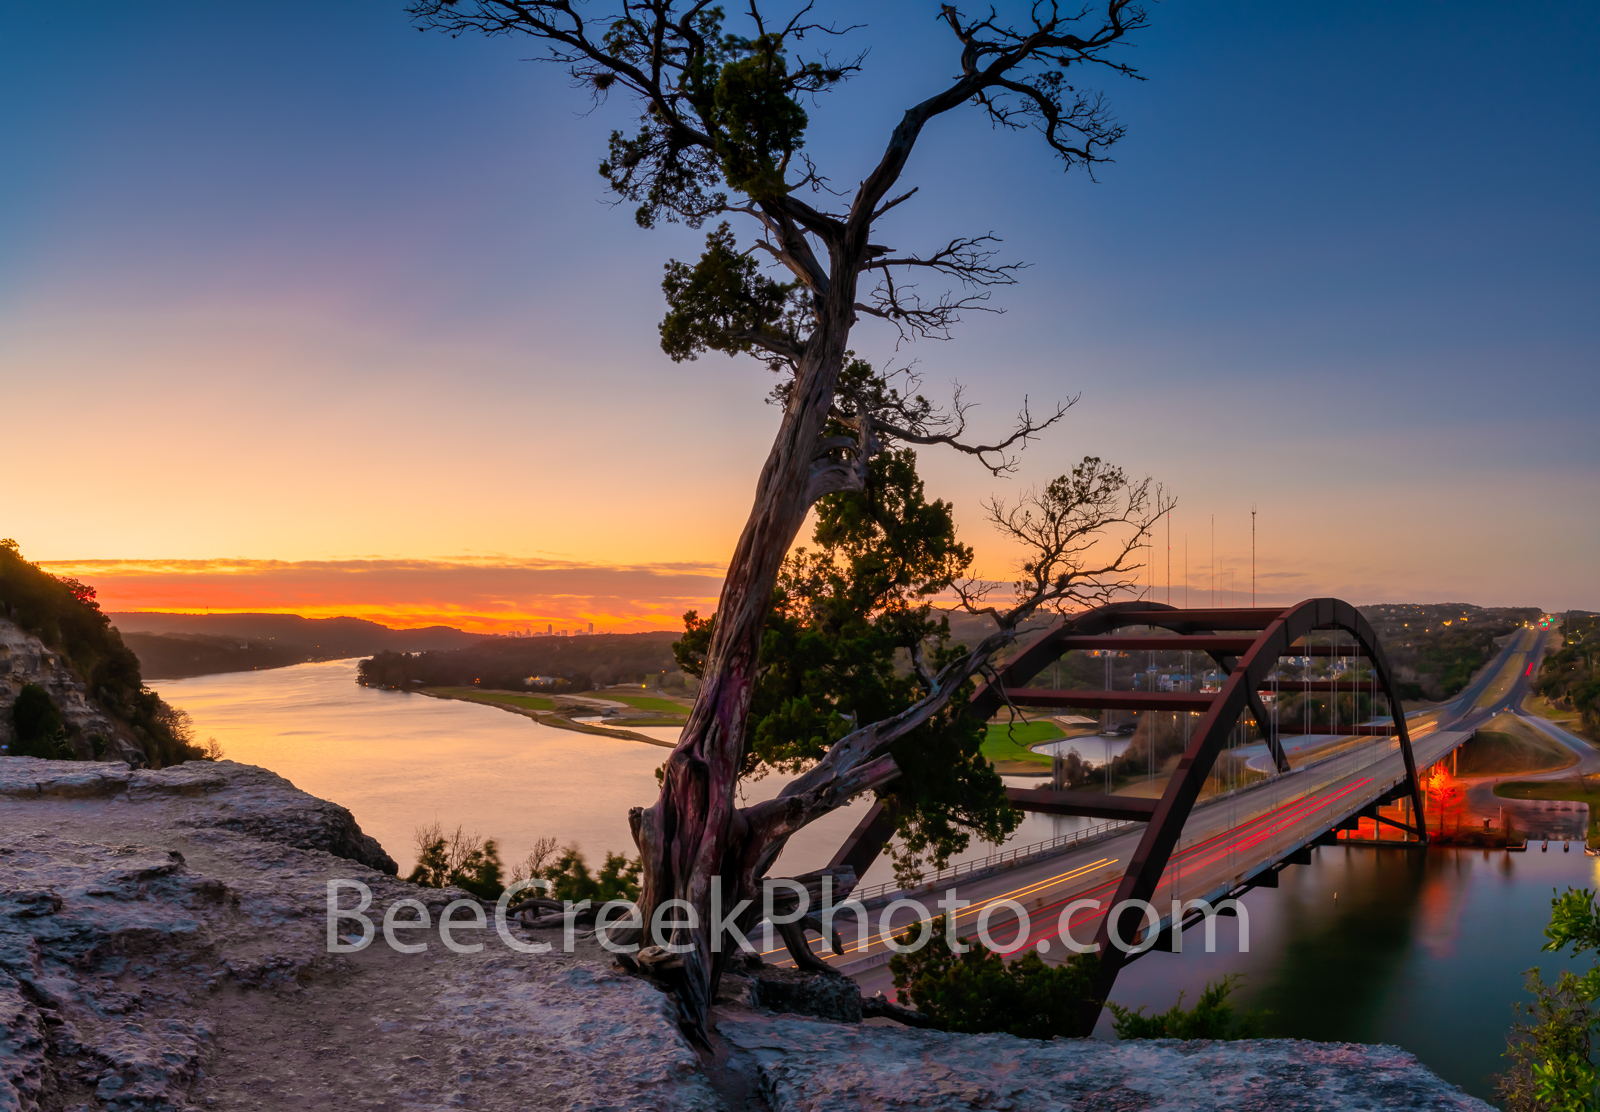 Texas, Austin,  Austin 360 bridge, pennybacker bridge, Austin Texas, Downtown Austin, urban, Lake Austin, colorado river, sunrise, glow, boating, fishing, cliff,, photo